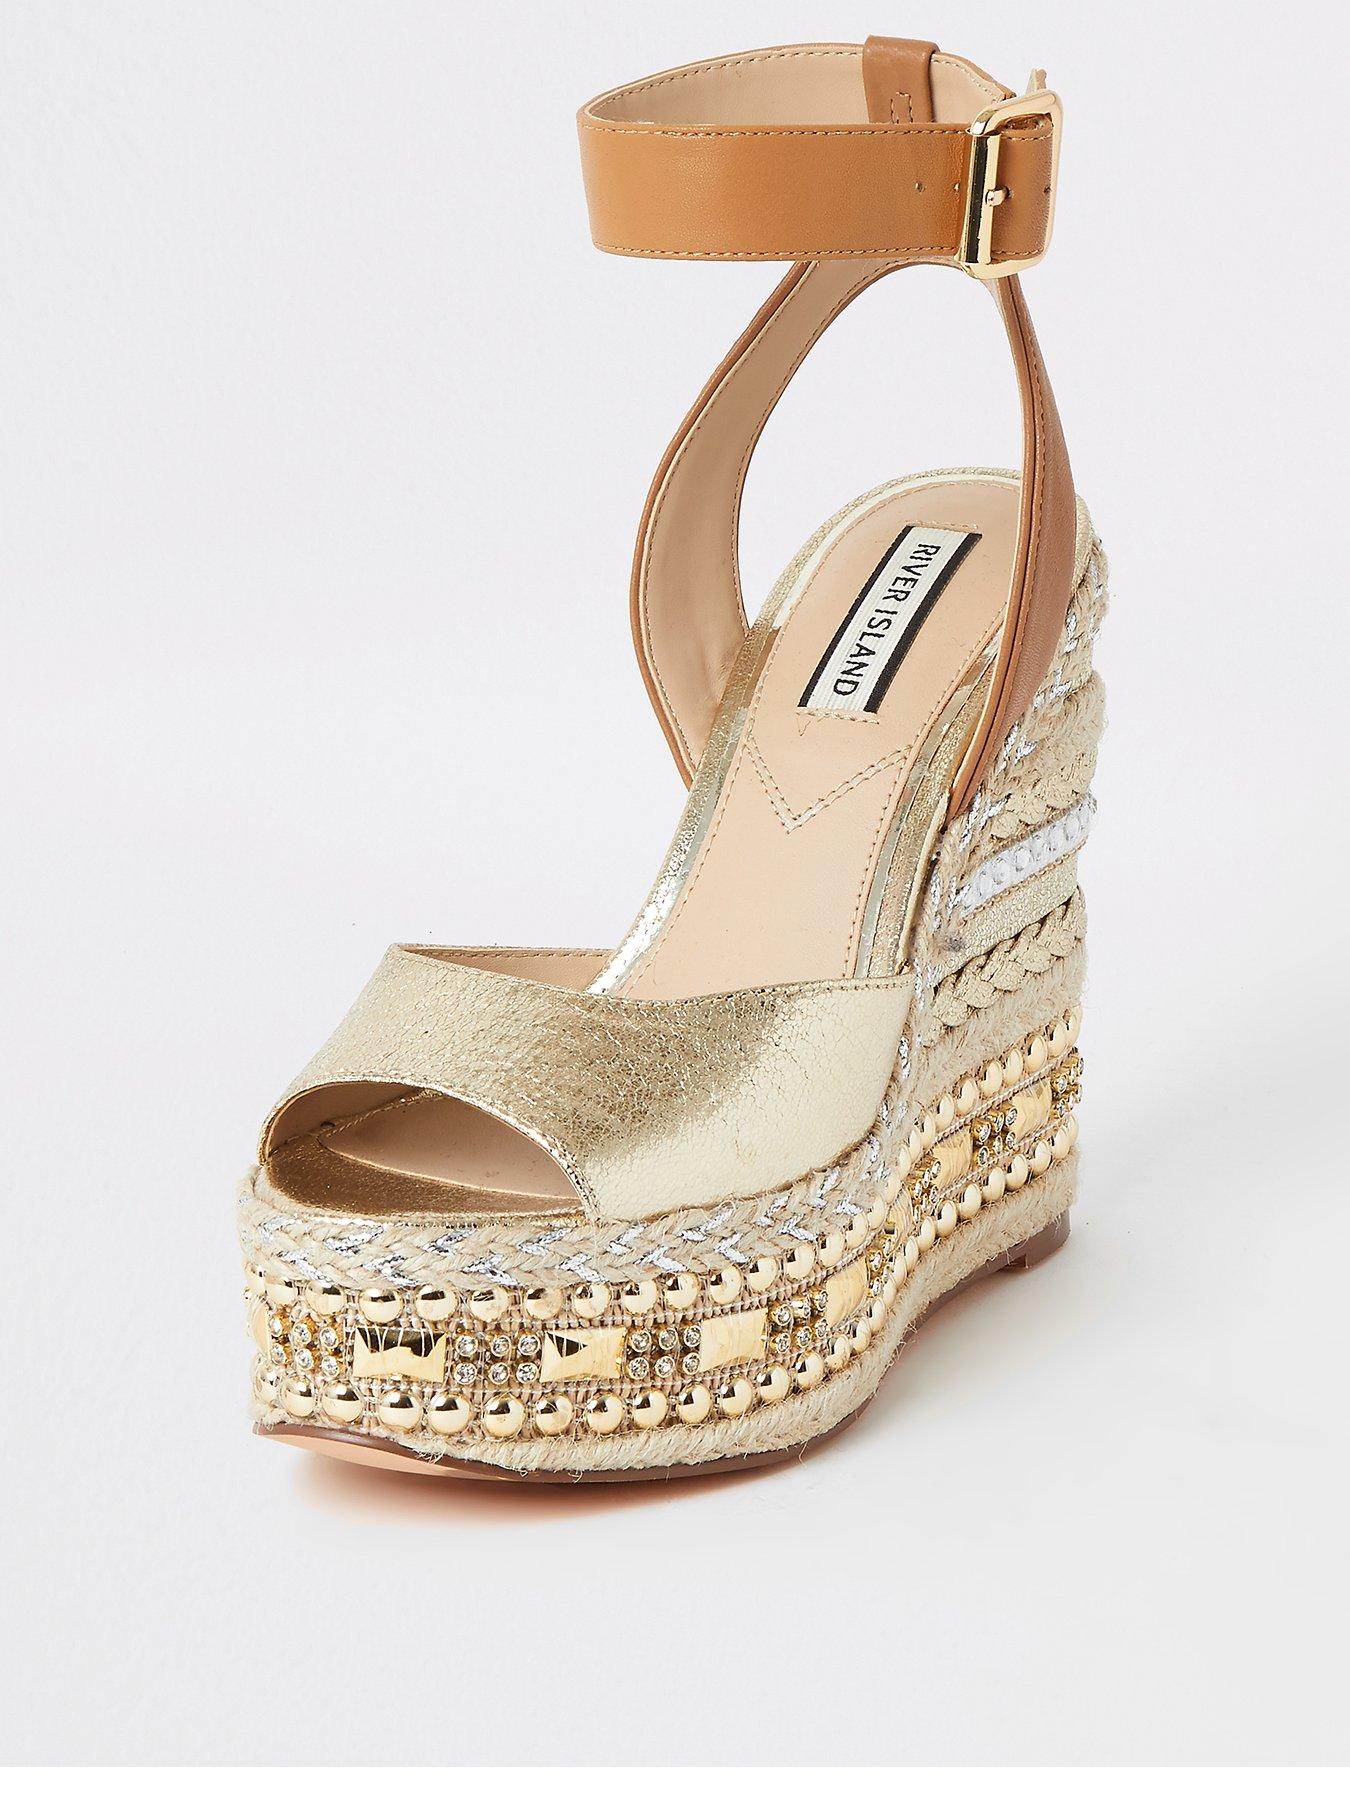 River island | Shoes \u0026 boots | Women